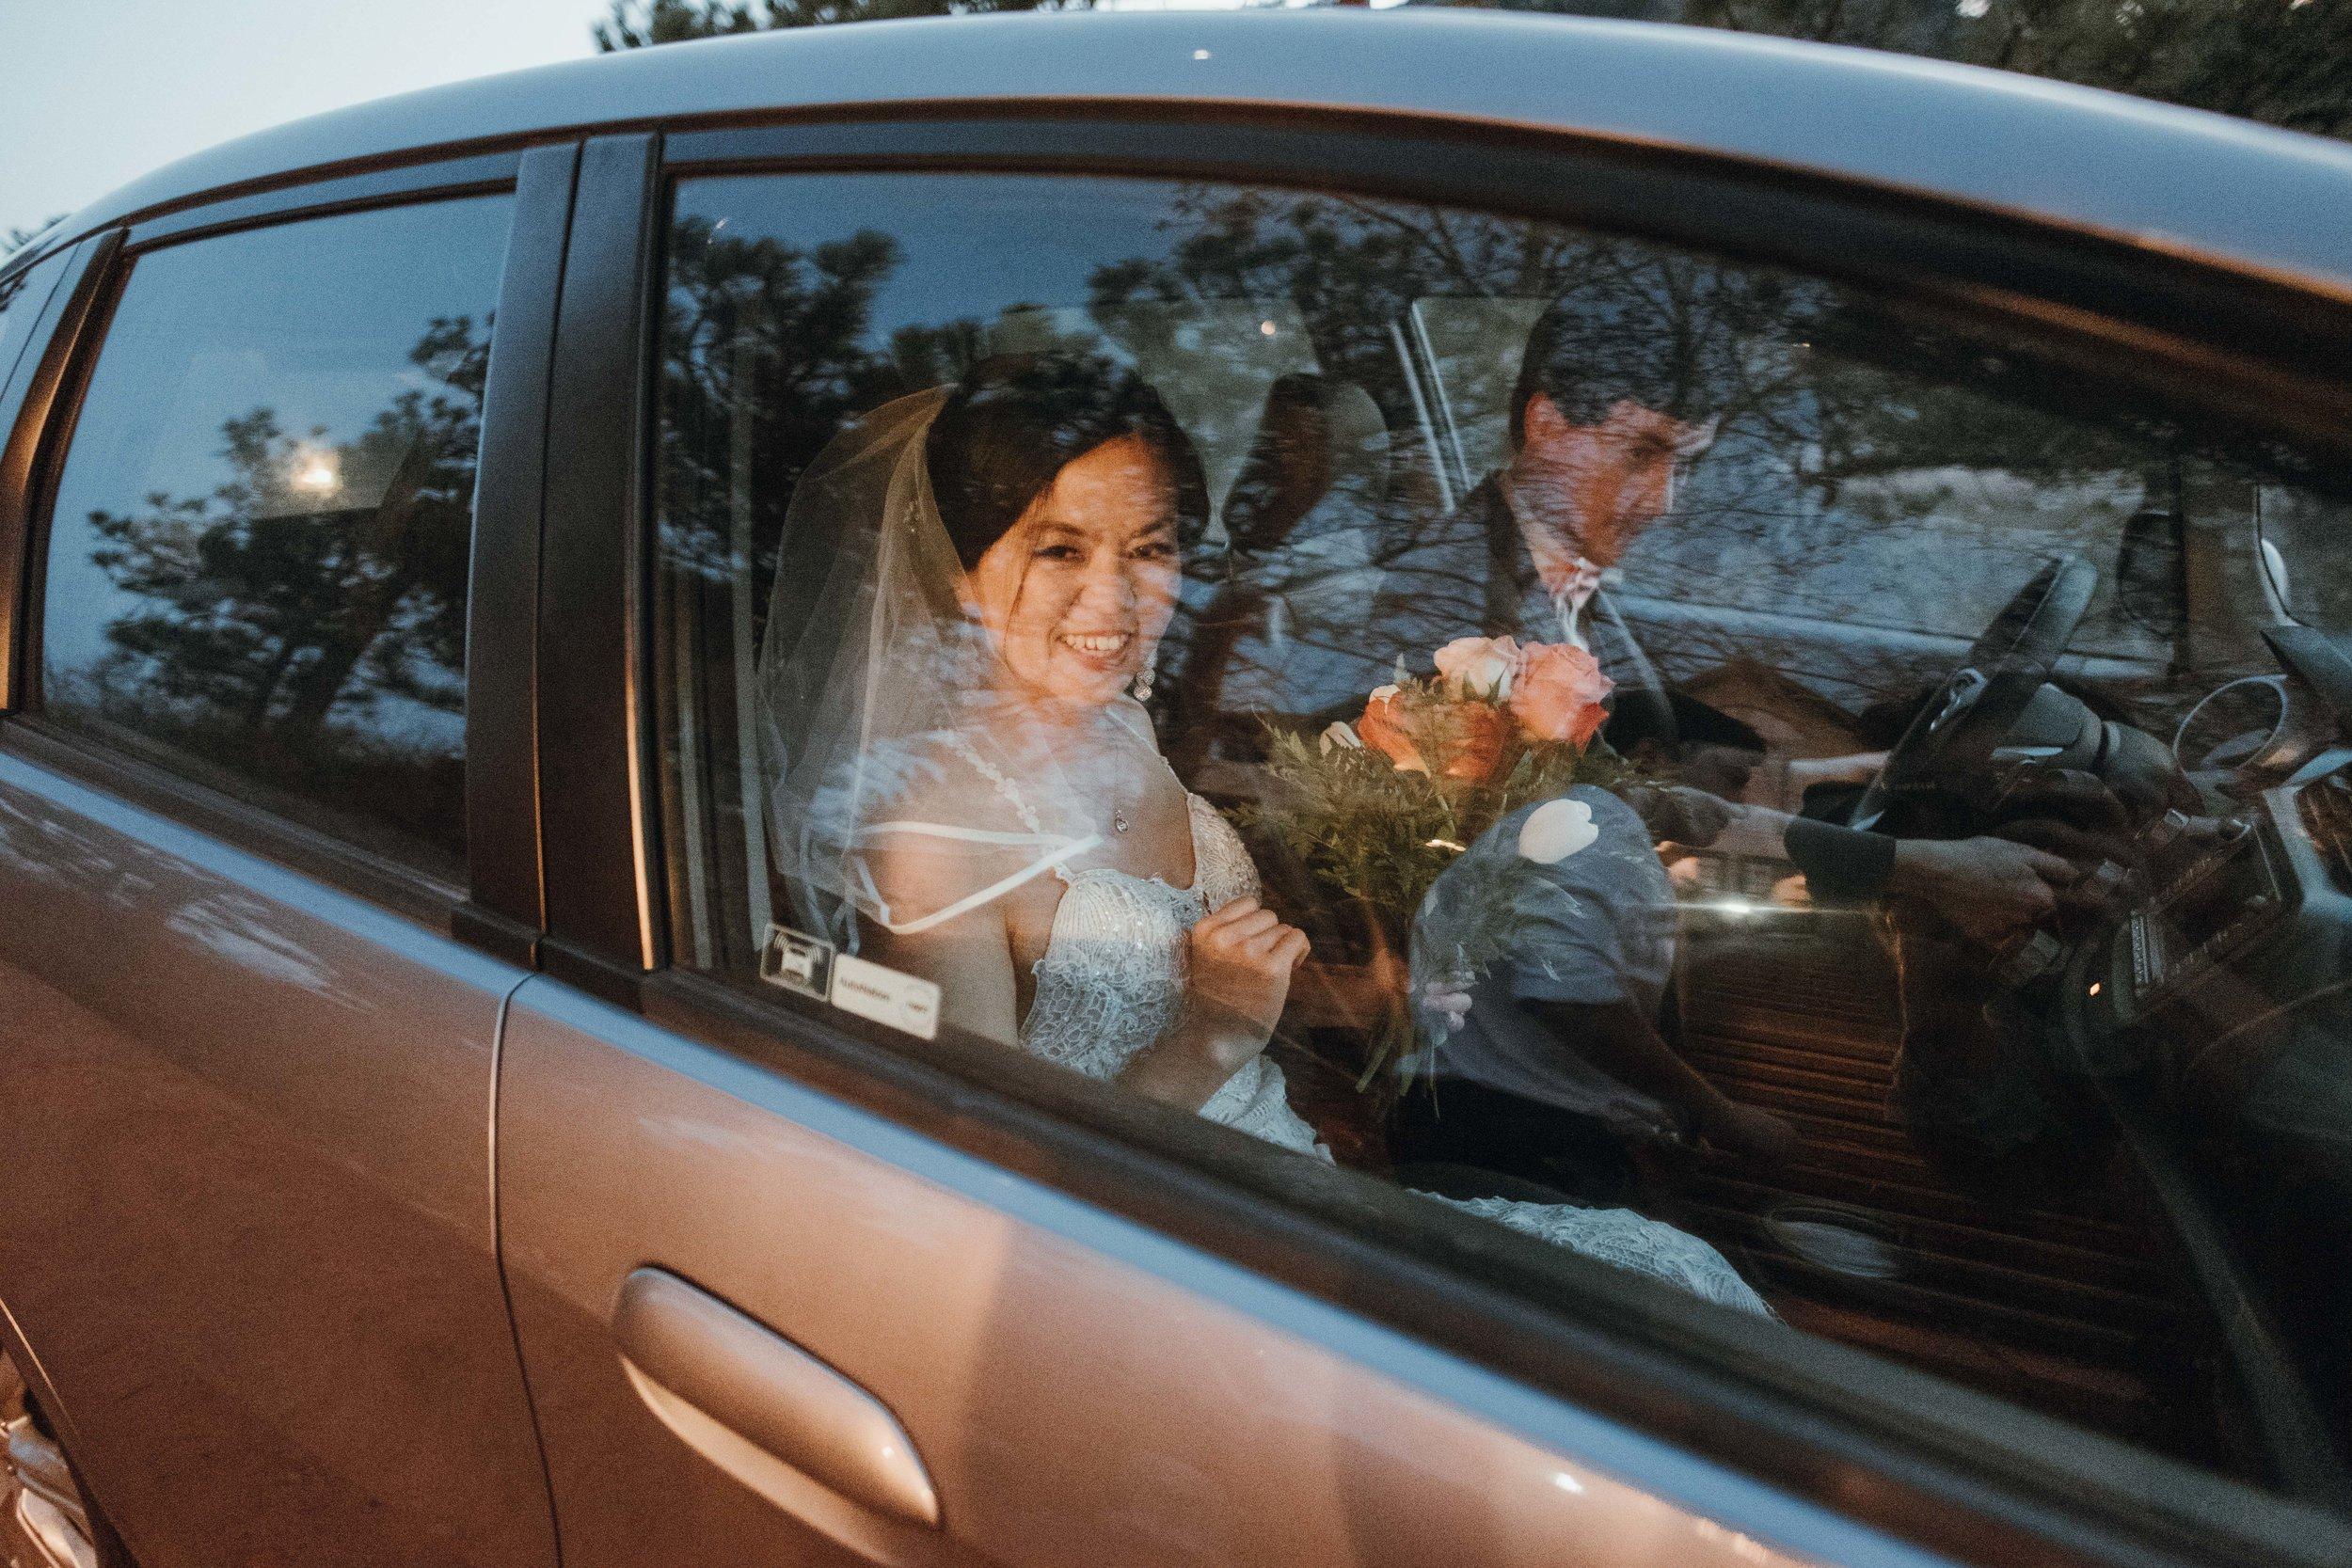 denver wedding photographer lioncrest manor in lyons ben and mali -DSC_0757.jpg